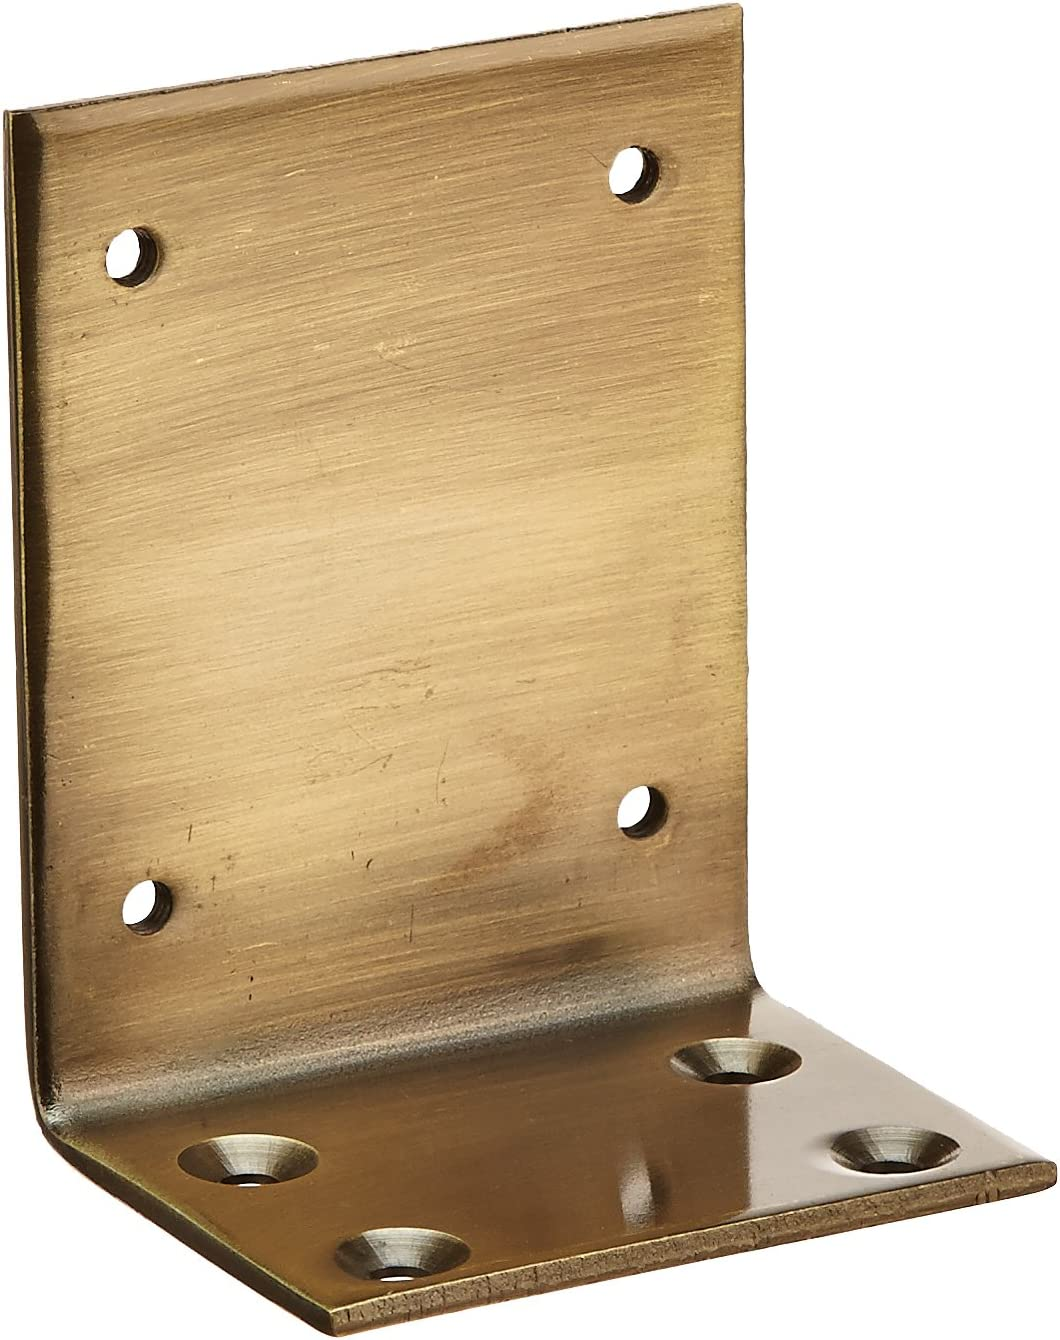 Deltana JB-DASH95U26 Solid Brass Jamb Bracket for DASH95